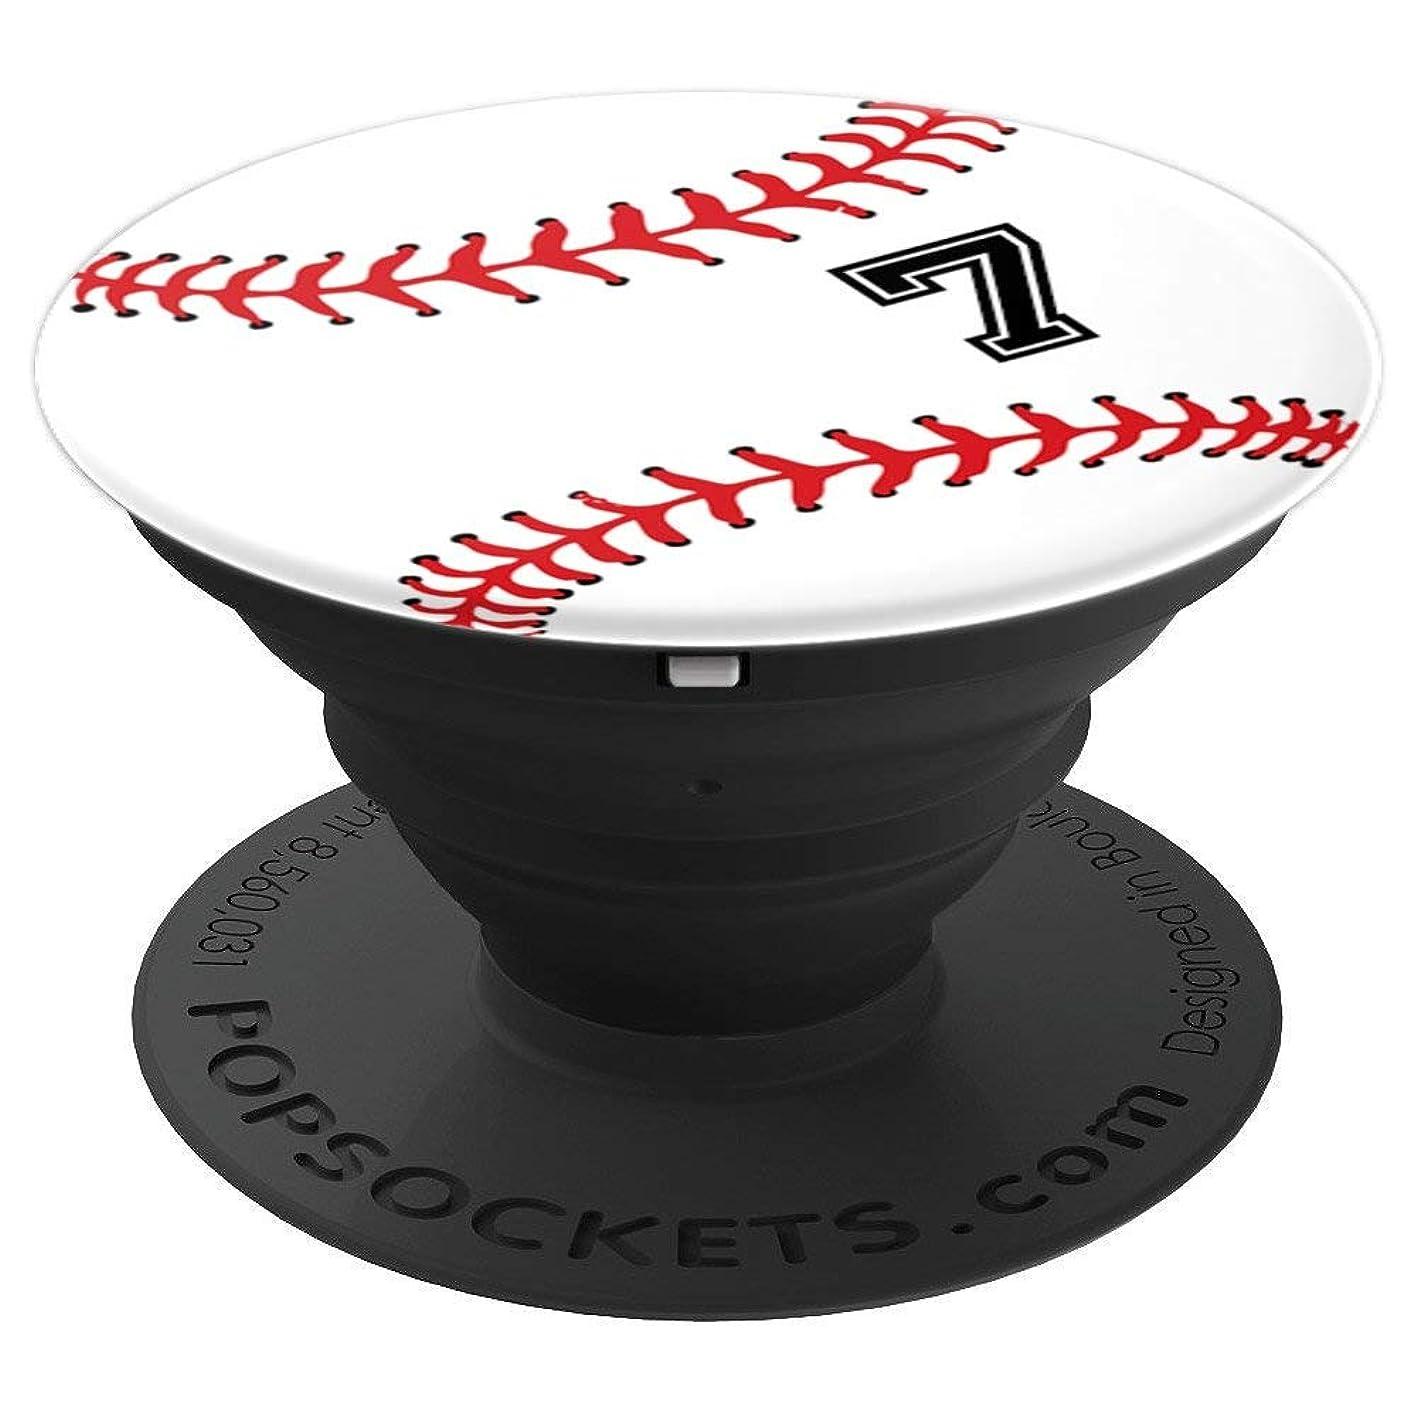 Number 7 Baseball - Design Series - PopSockets Grip and Stand for Phones and Tablets zbemmmjmzru005